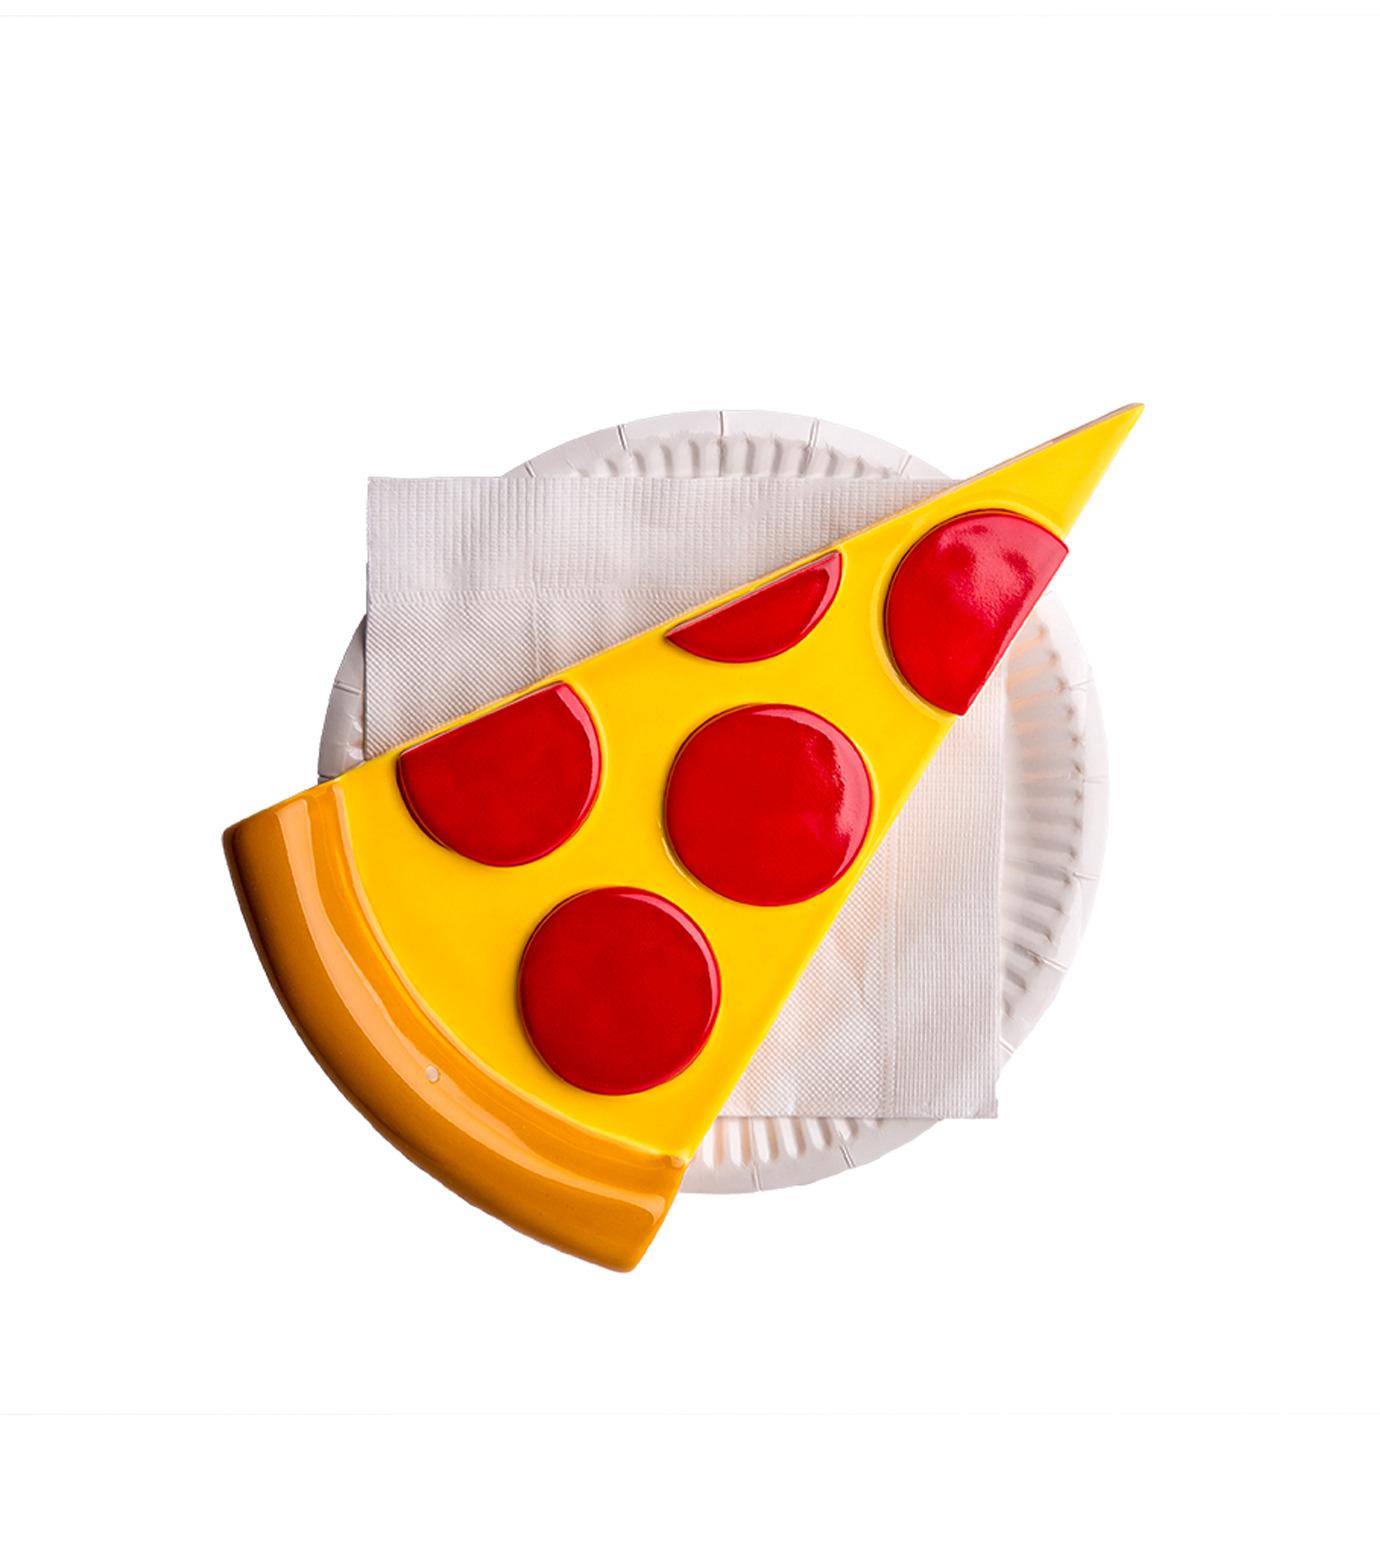 NONCENSE(ノンセンス)のNoncesne Pizza ceramic incense burner-MULTI COLOUR(インテリア/interior)-N2-9 拡大詳細画像2